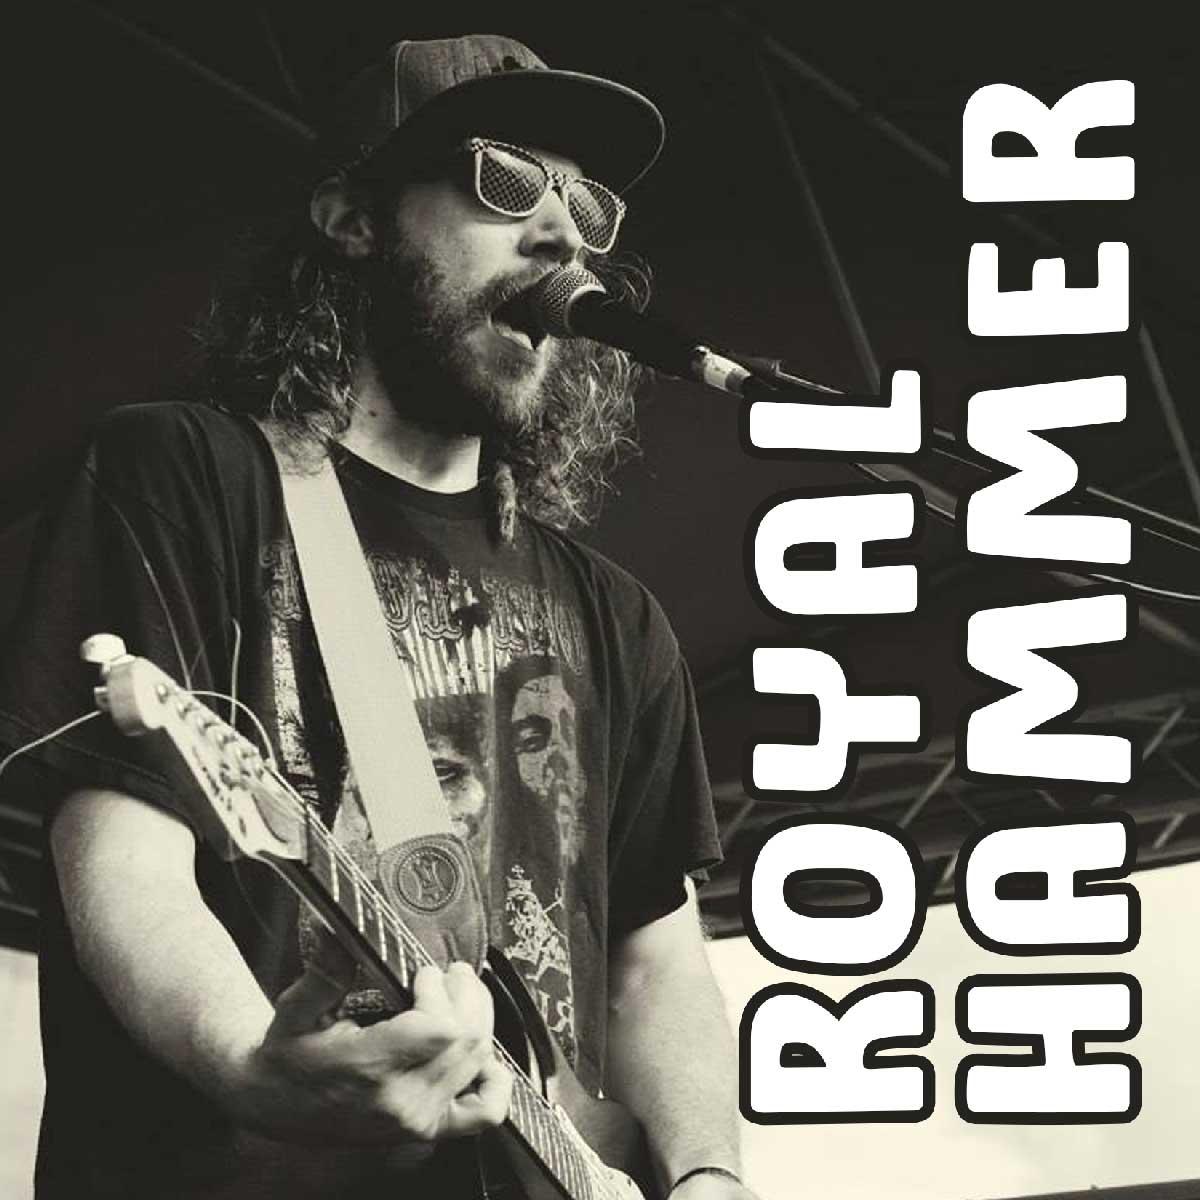 Royal Hammer